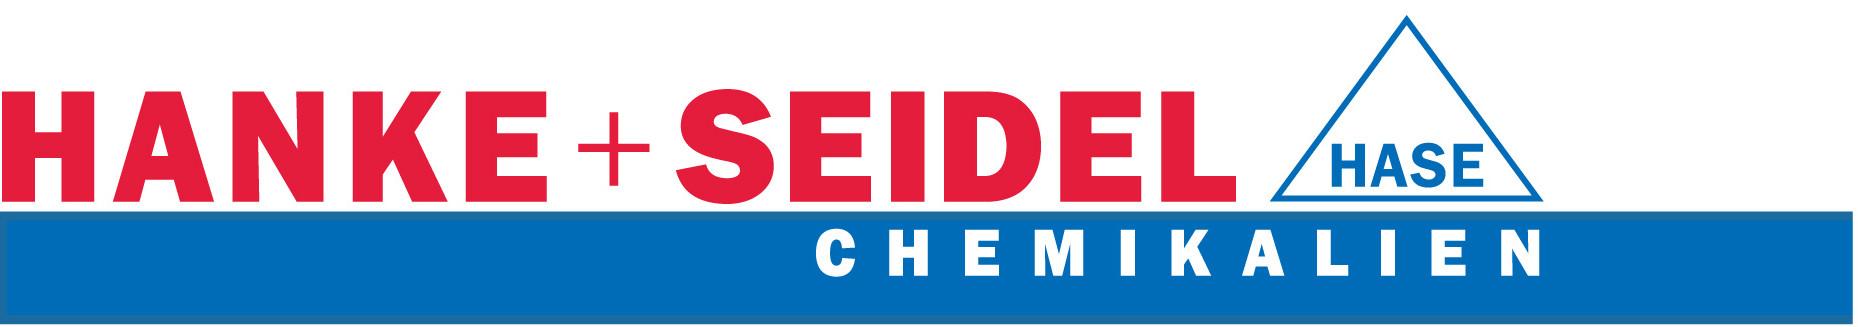 Hanke + Seidel GmbH & Co. KG